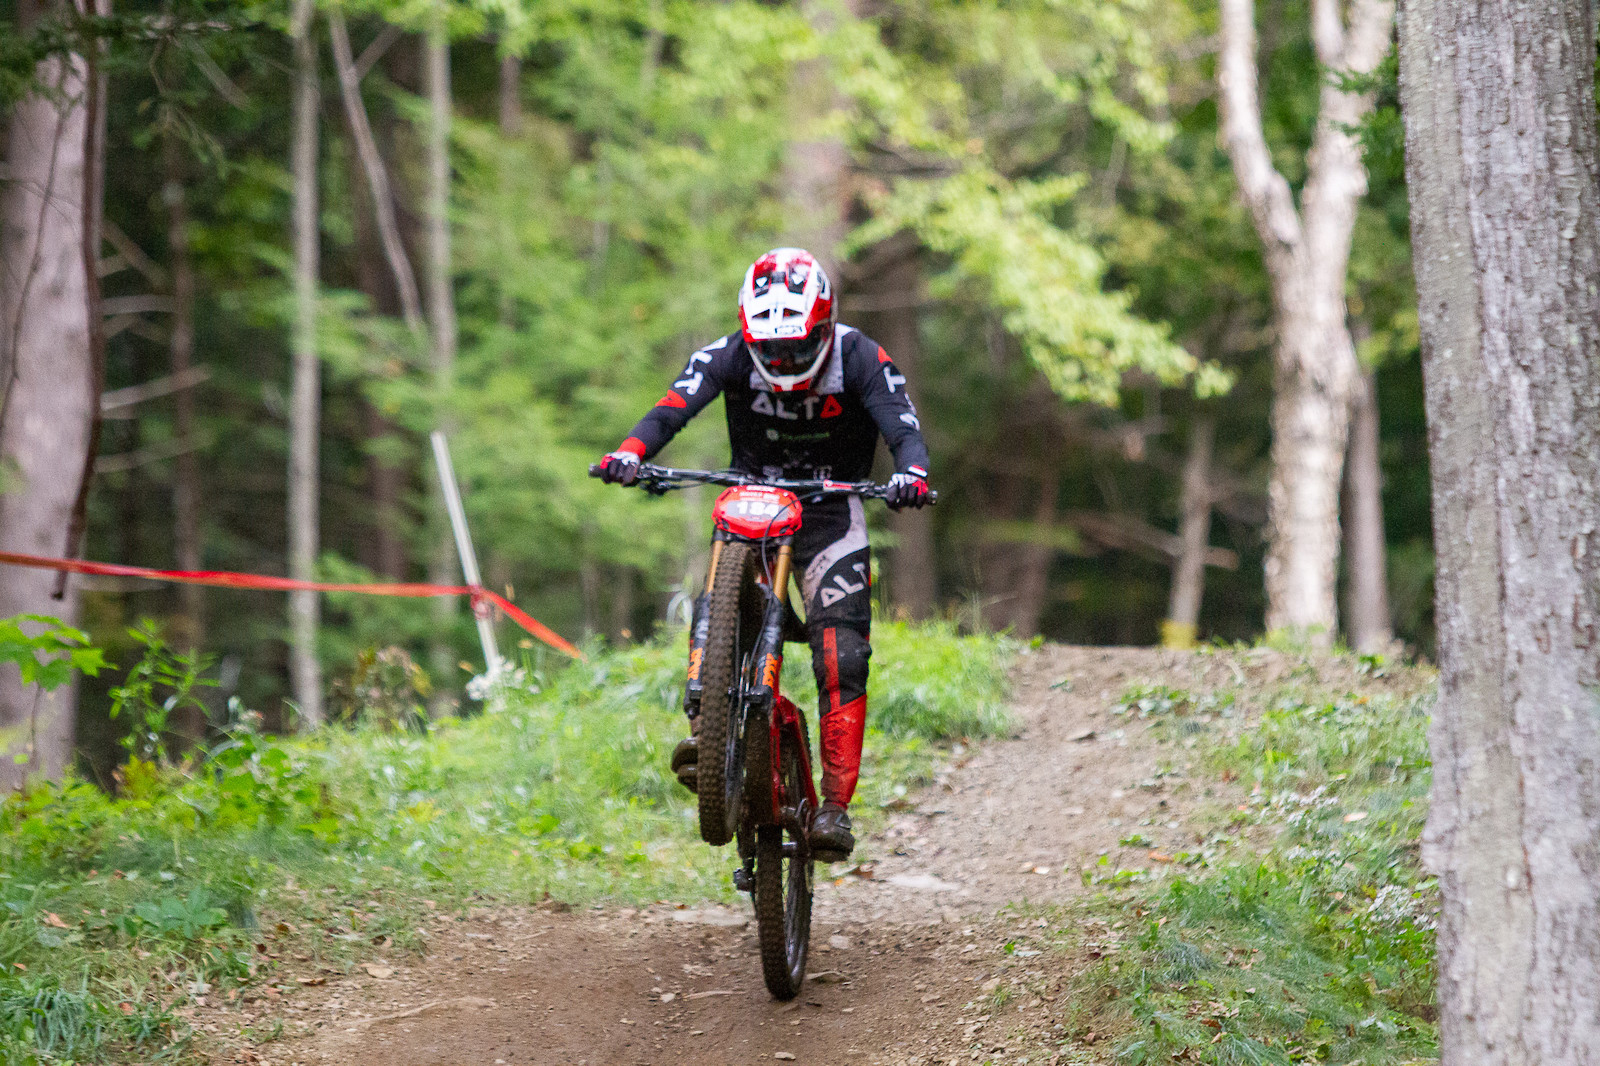 Rafael Ferreira - JackRice - Mountain Biking Pictures - Vital MTB